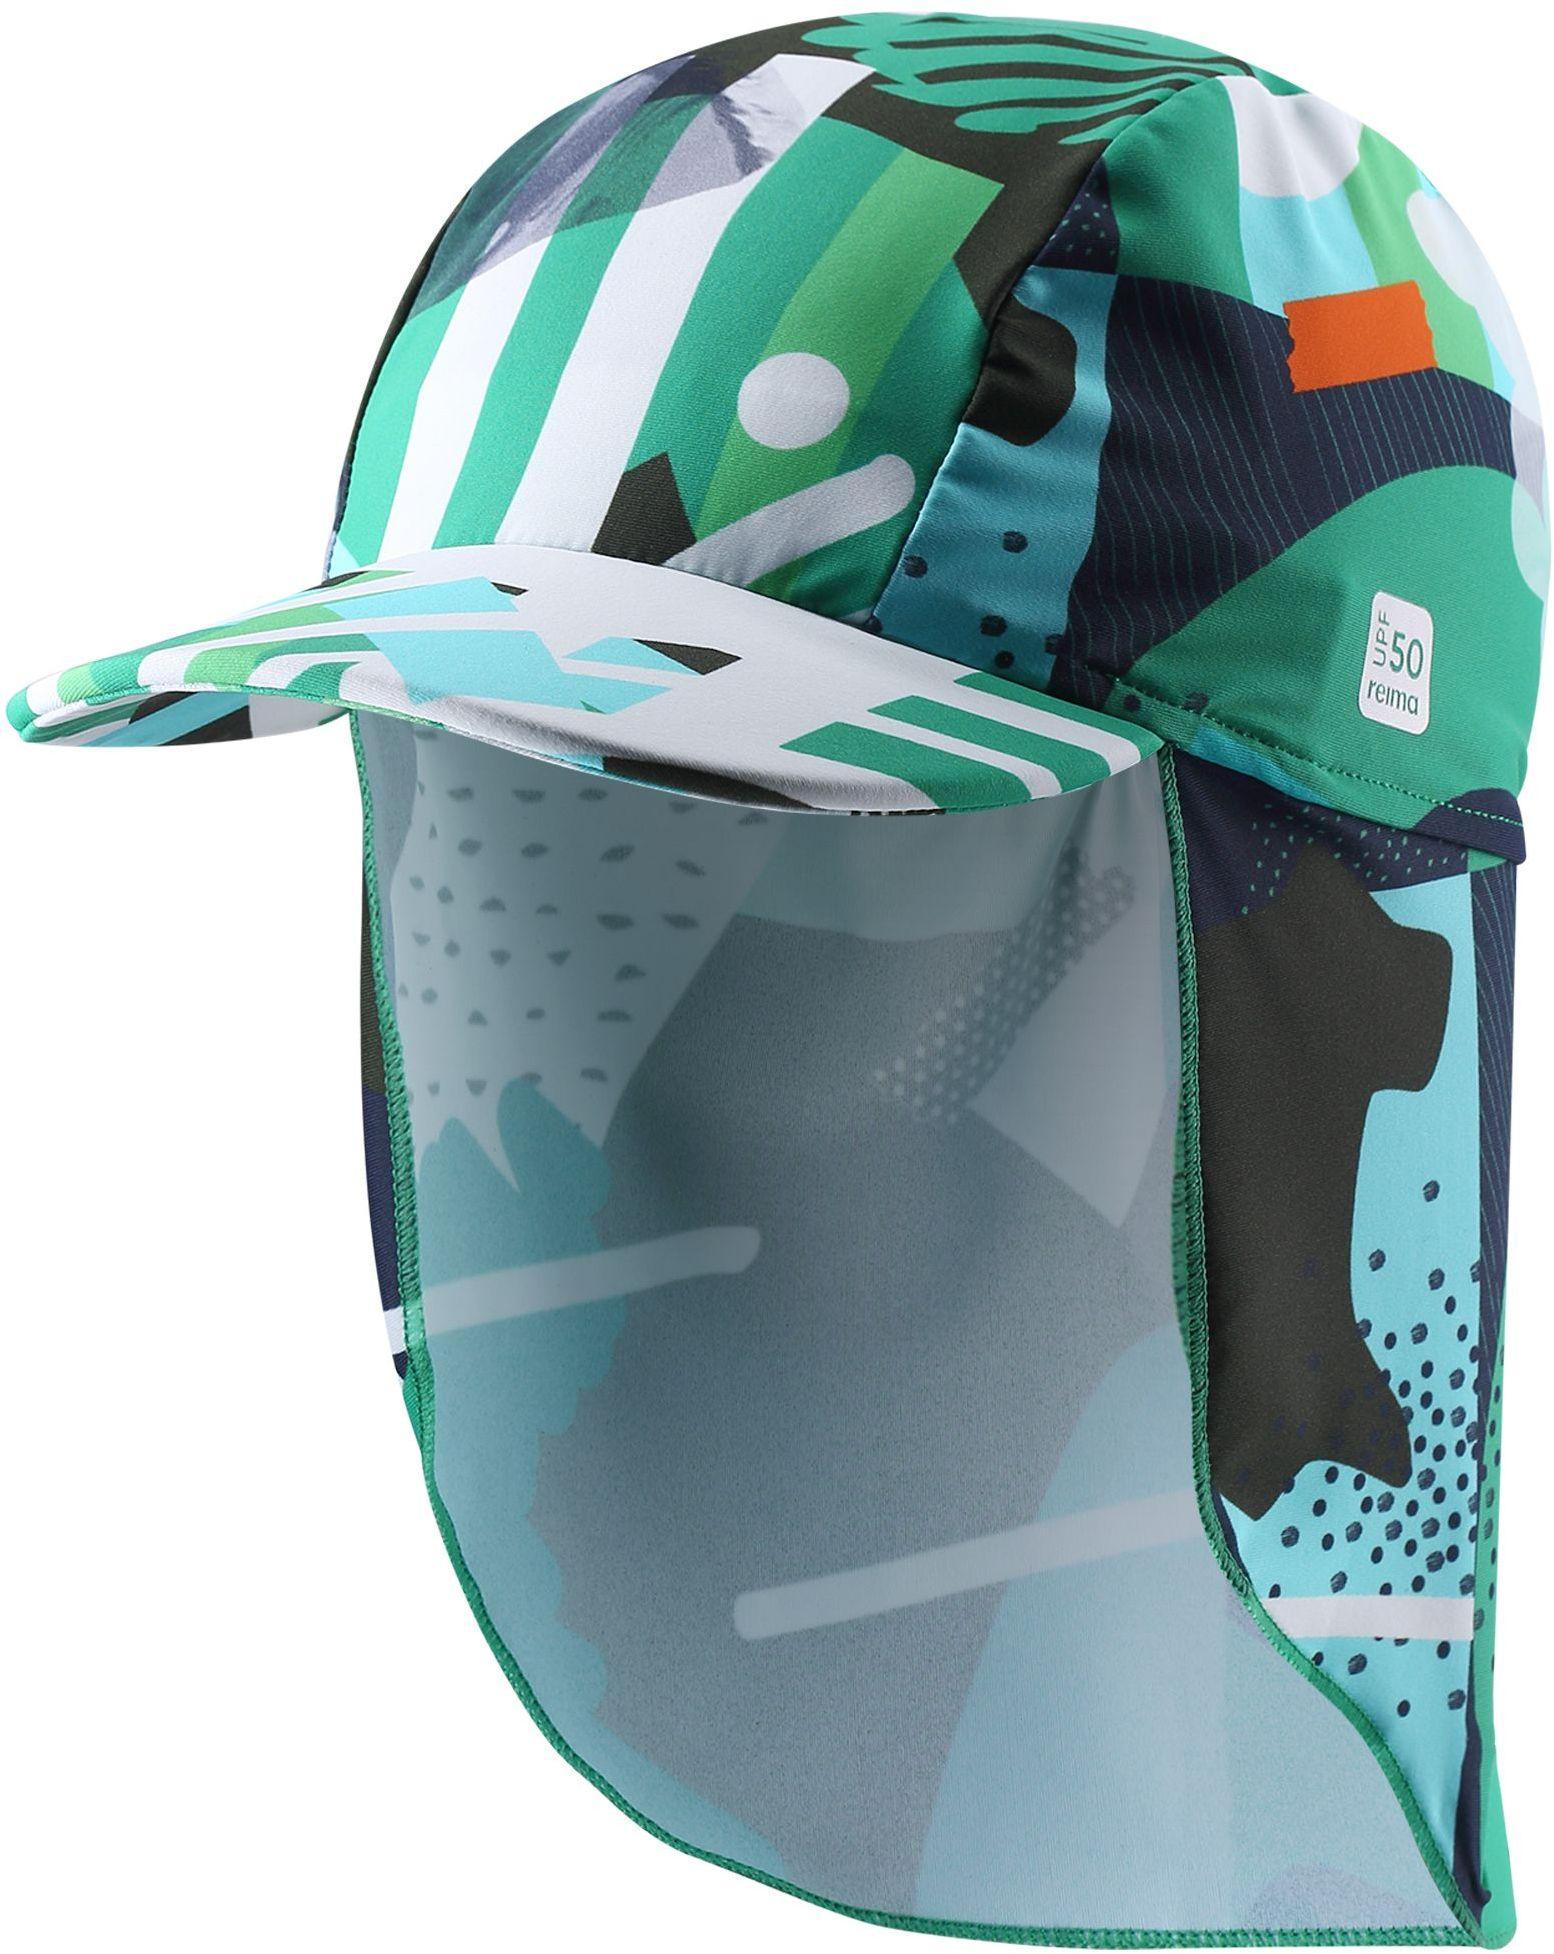 Reima Turtle - Jungle green siltovka pre chlapca s UV ochranou proti slnku